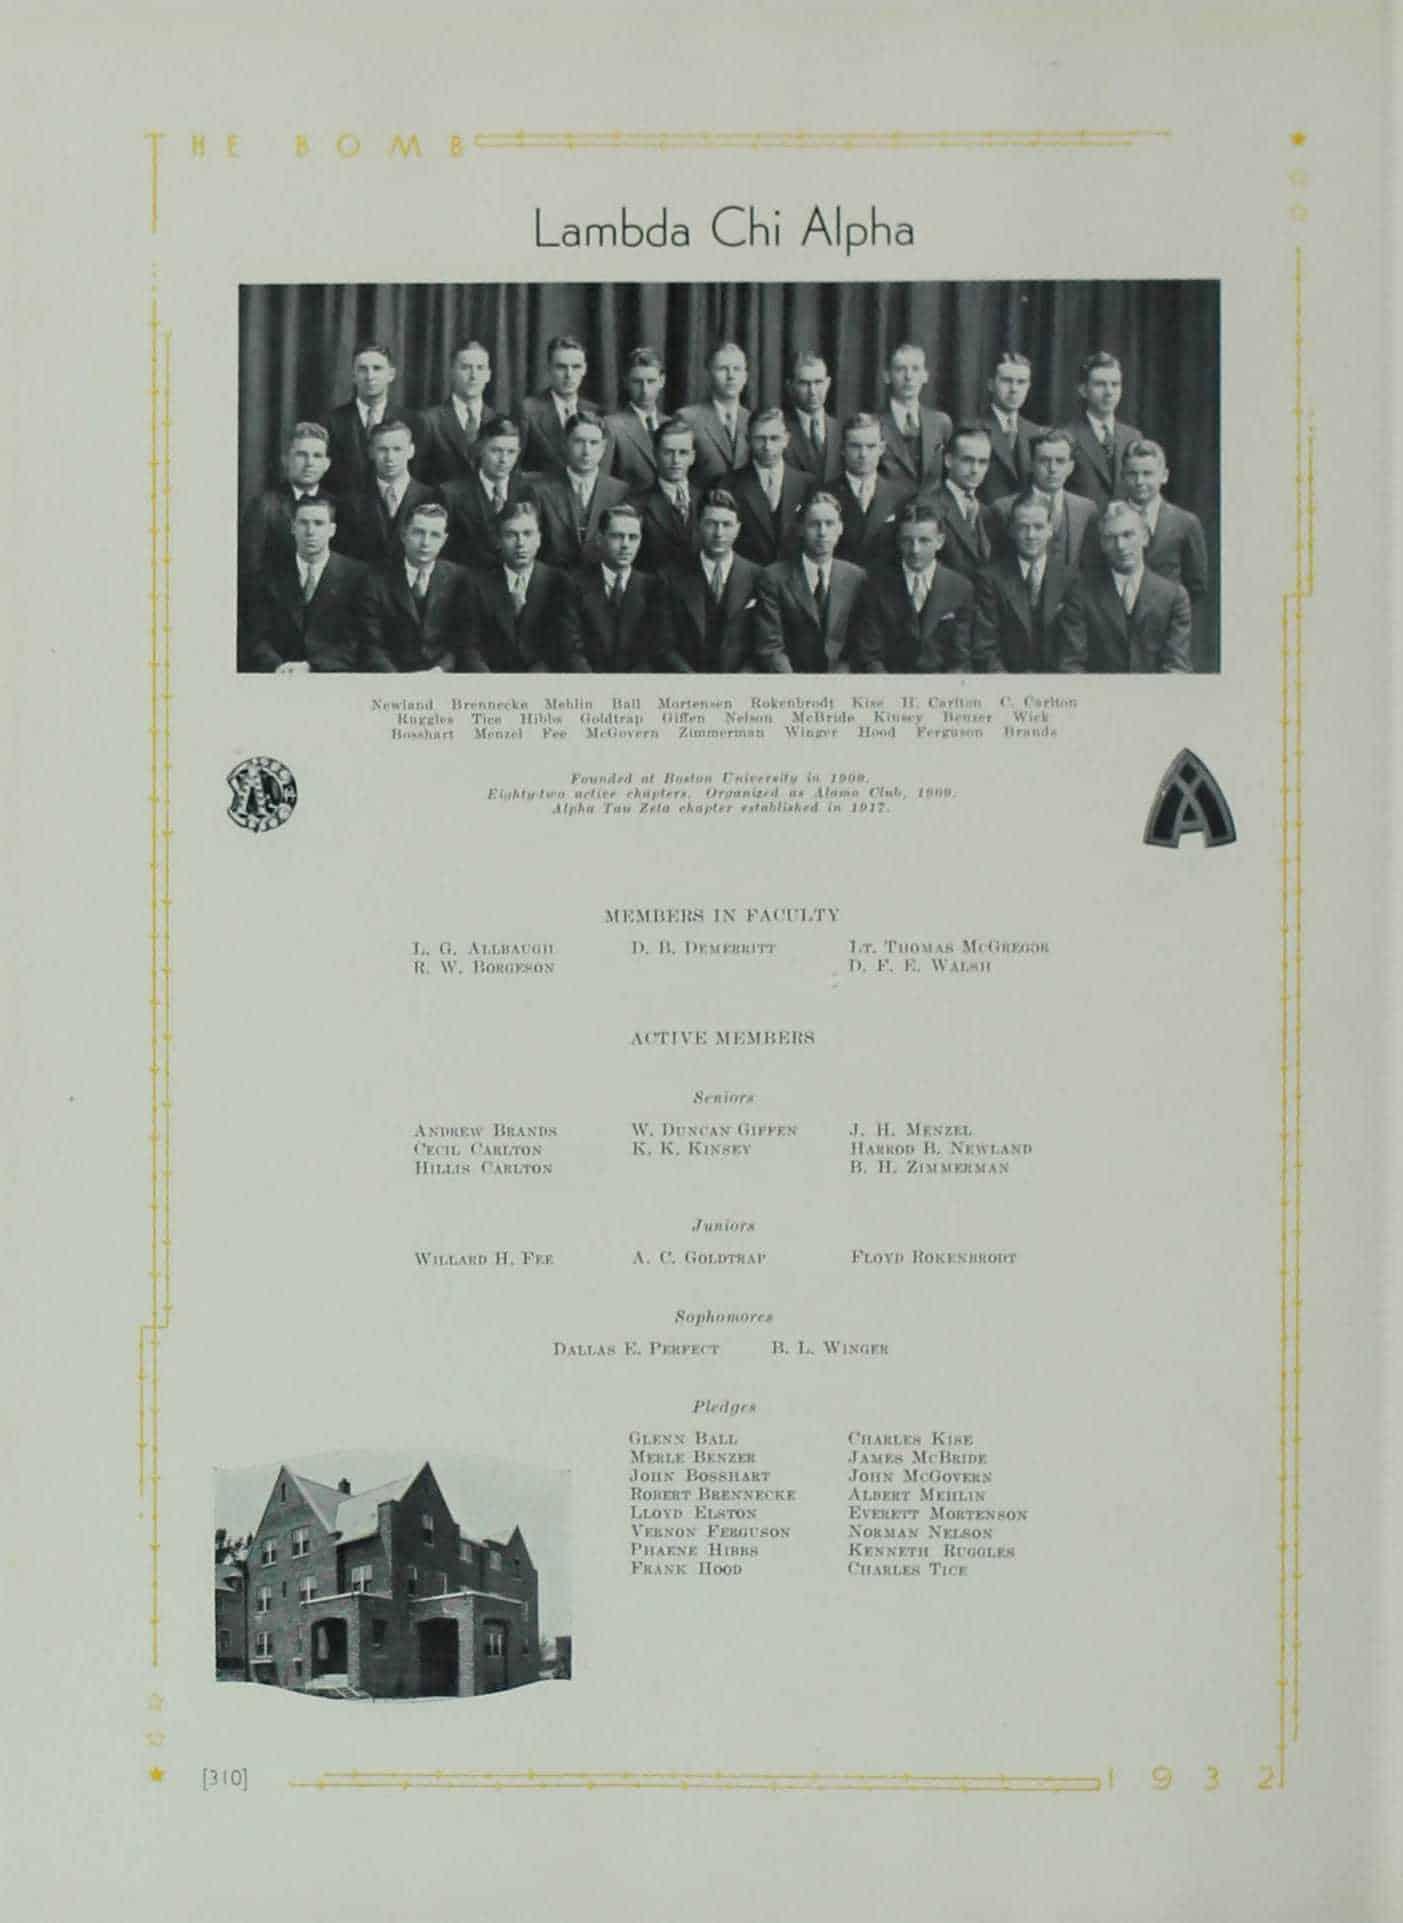 1932 Lambda Chi Alpha